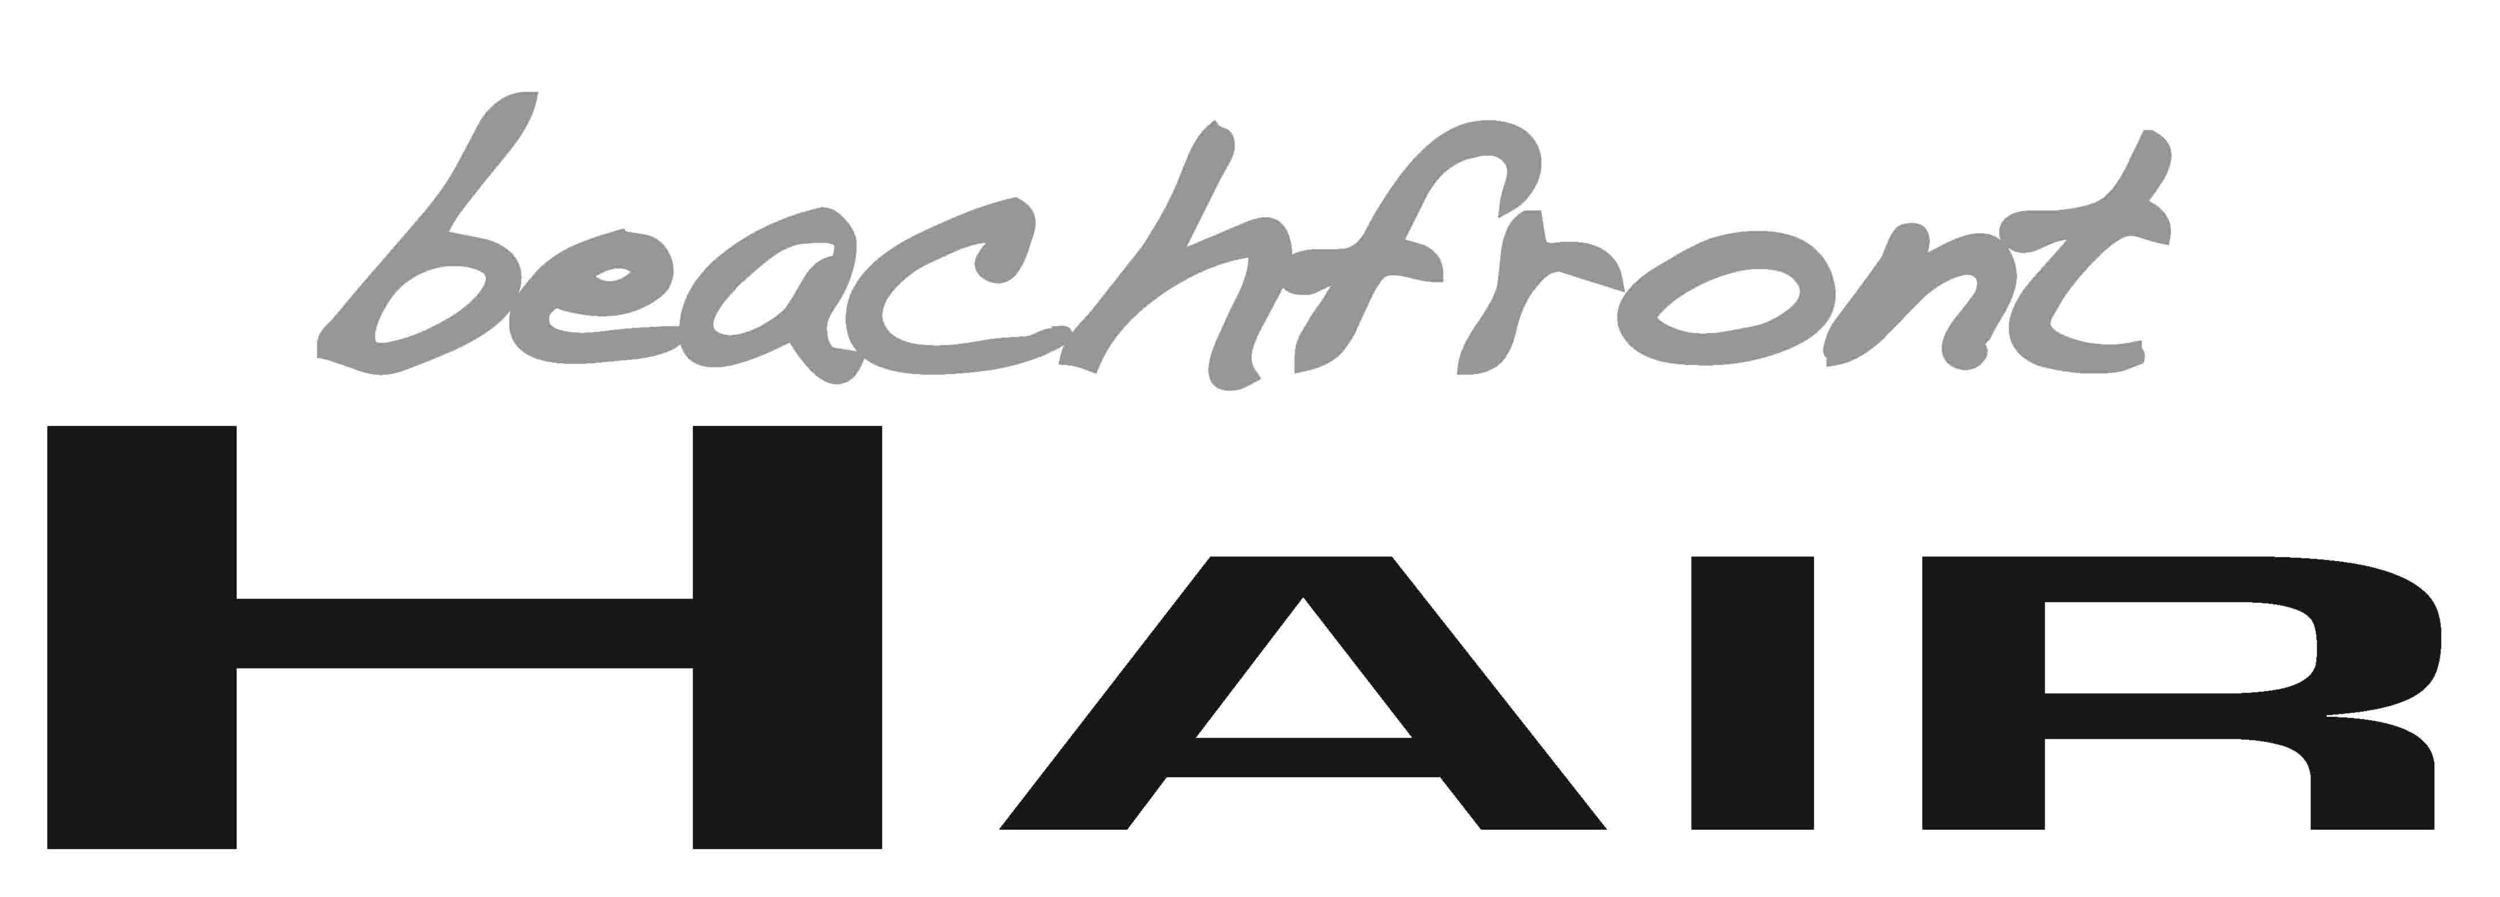 Beachfront Hair logo.jpg